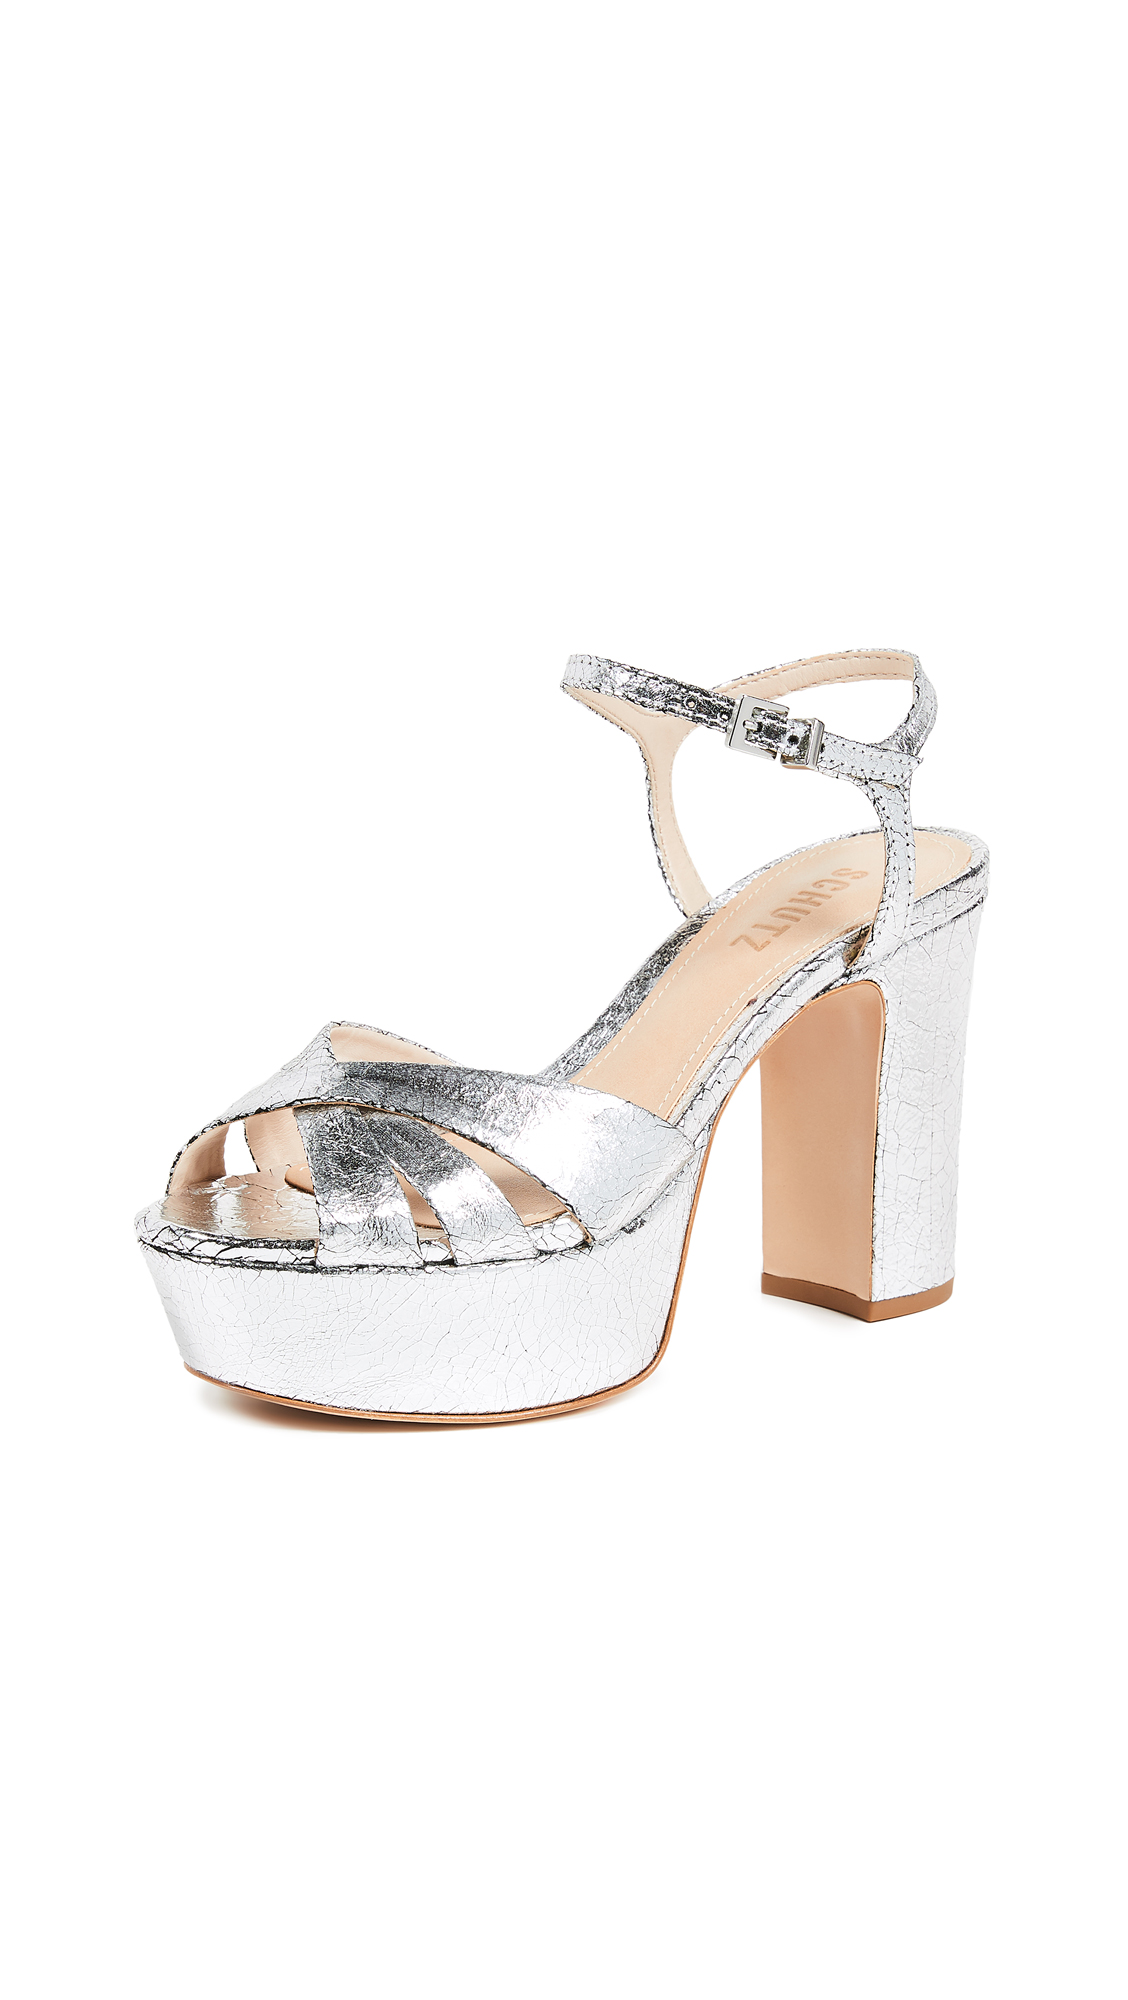 Schutz Keefa Platform Sandals - Prata